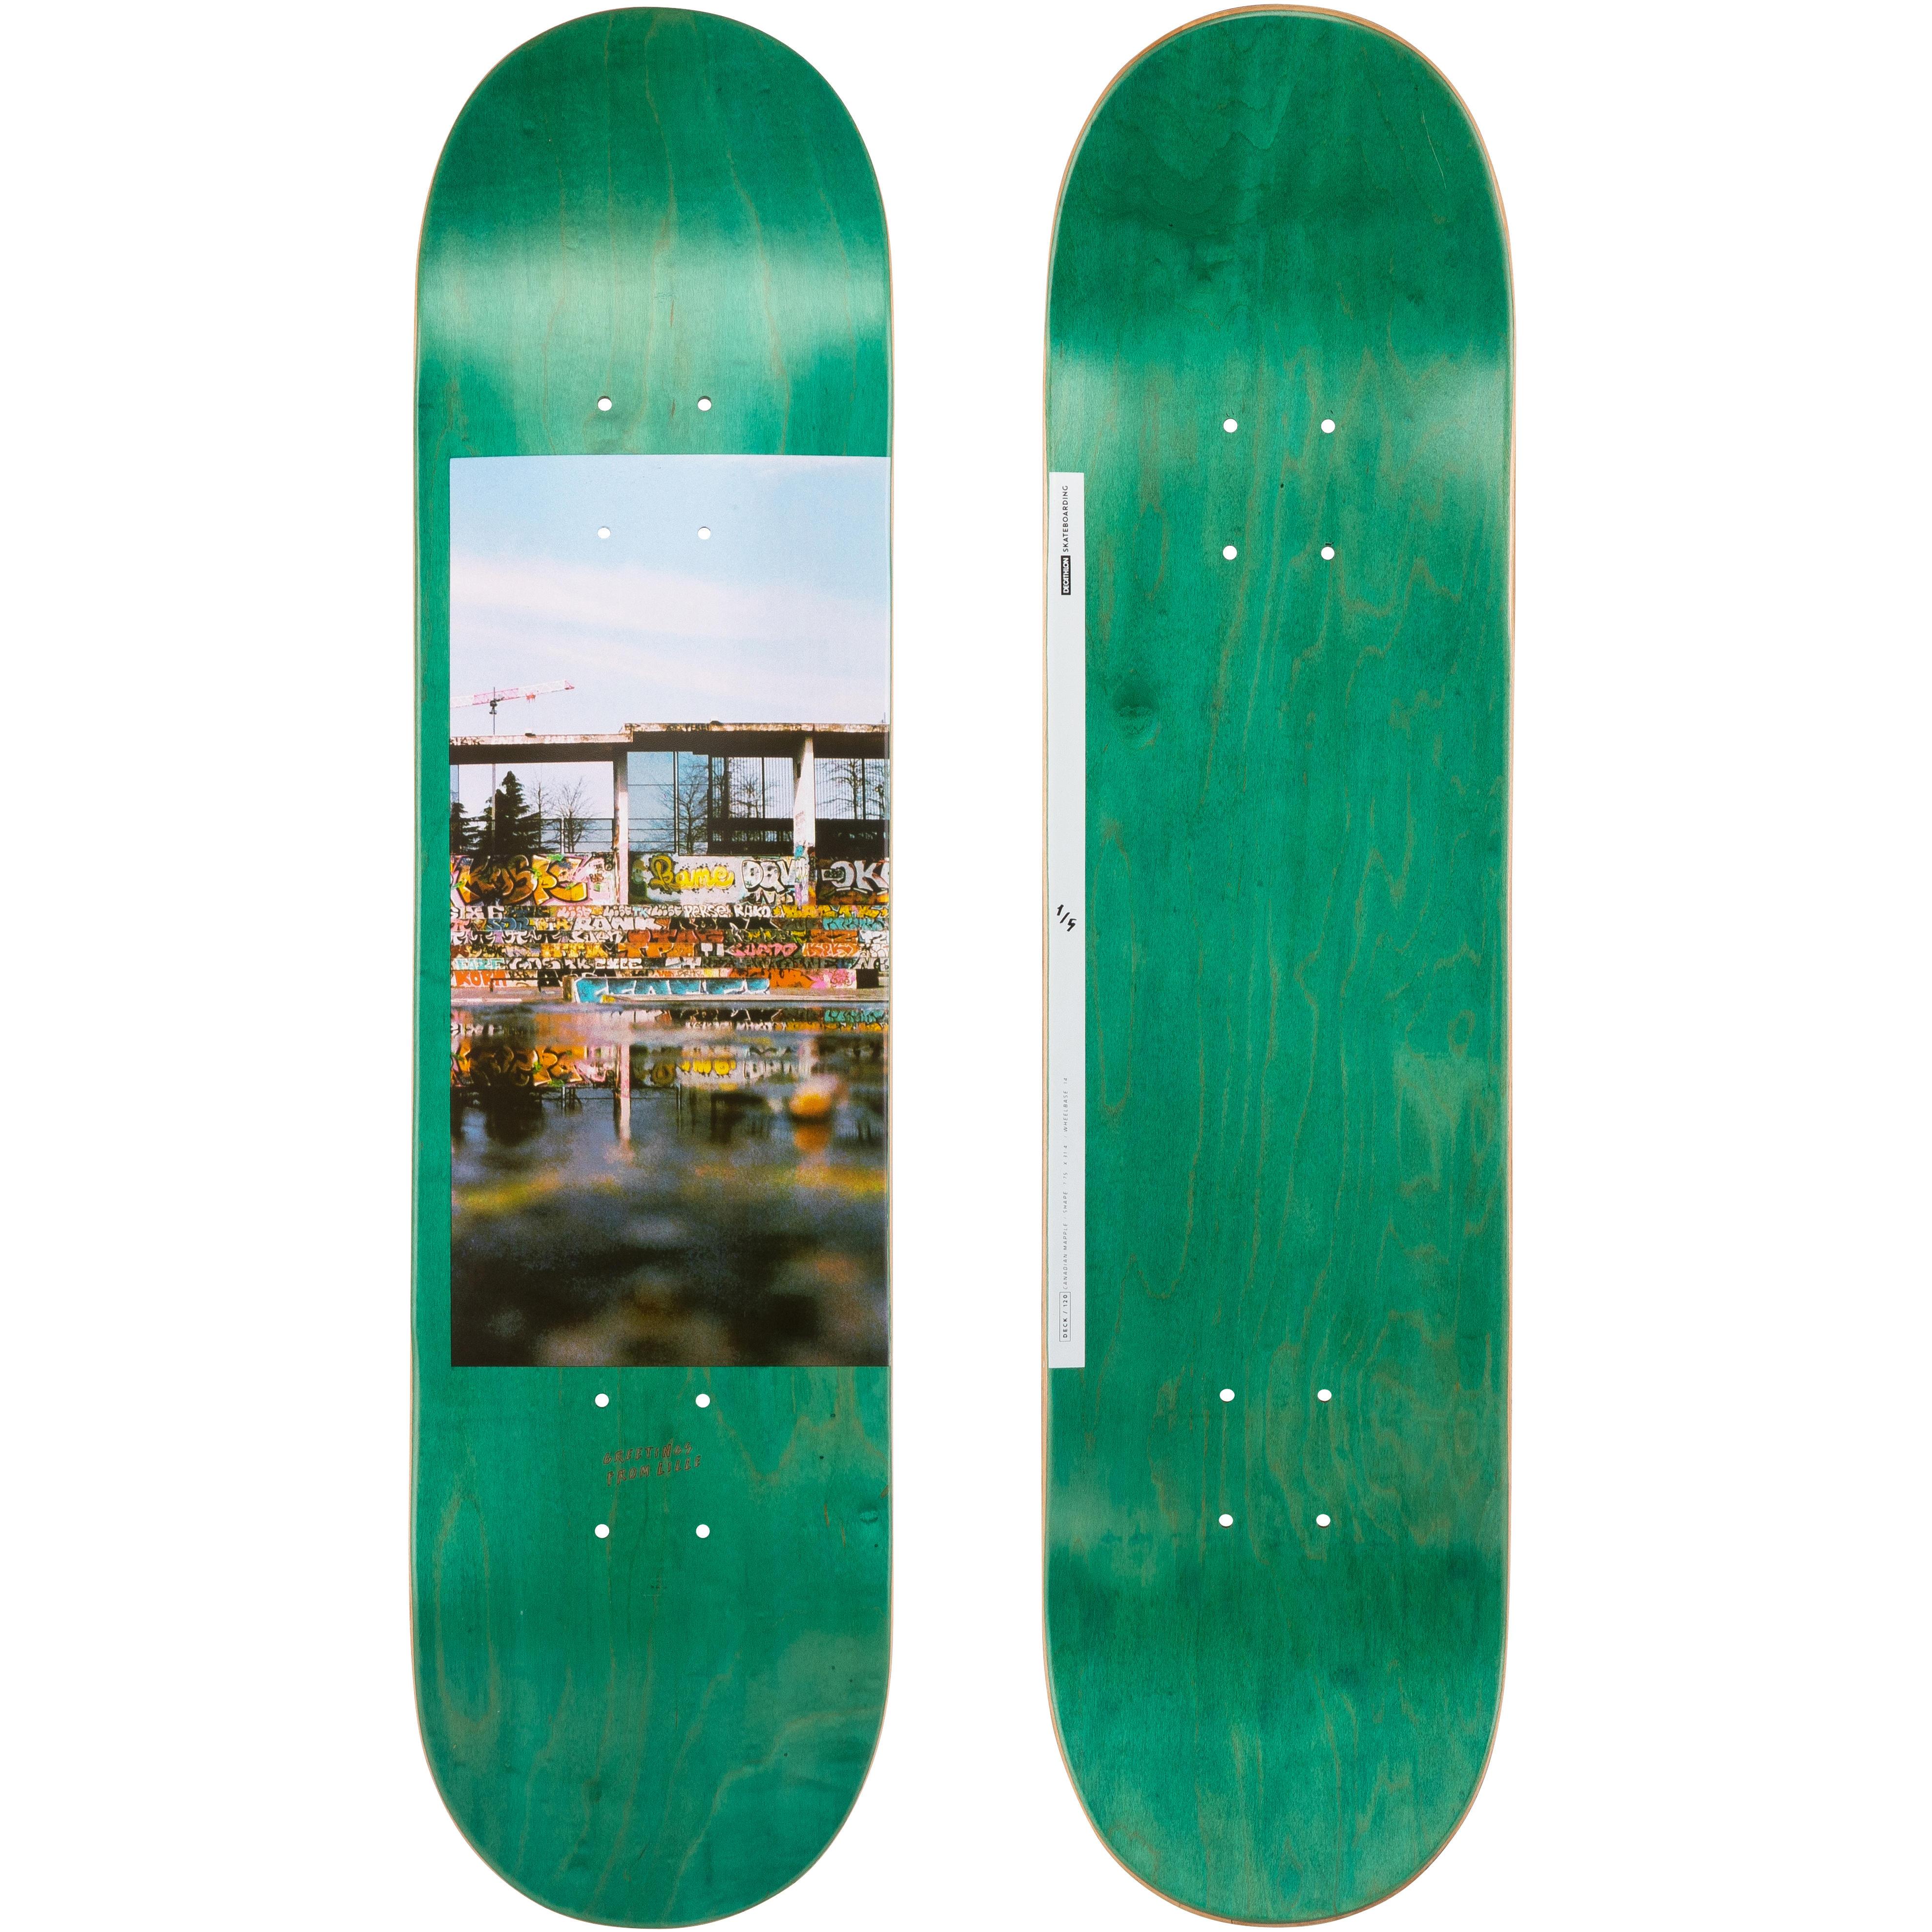 Oxelo Planche de skate DECK 120 taille 7.75 couleur verte. - Oxelo